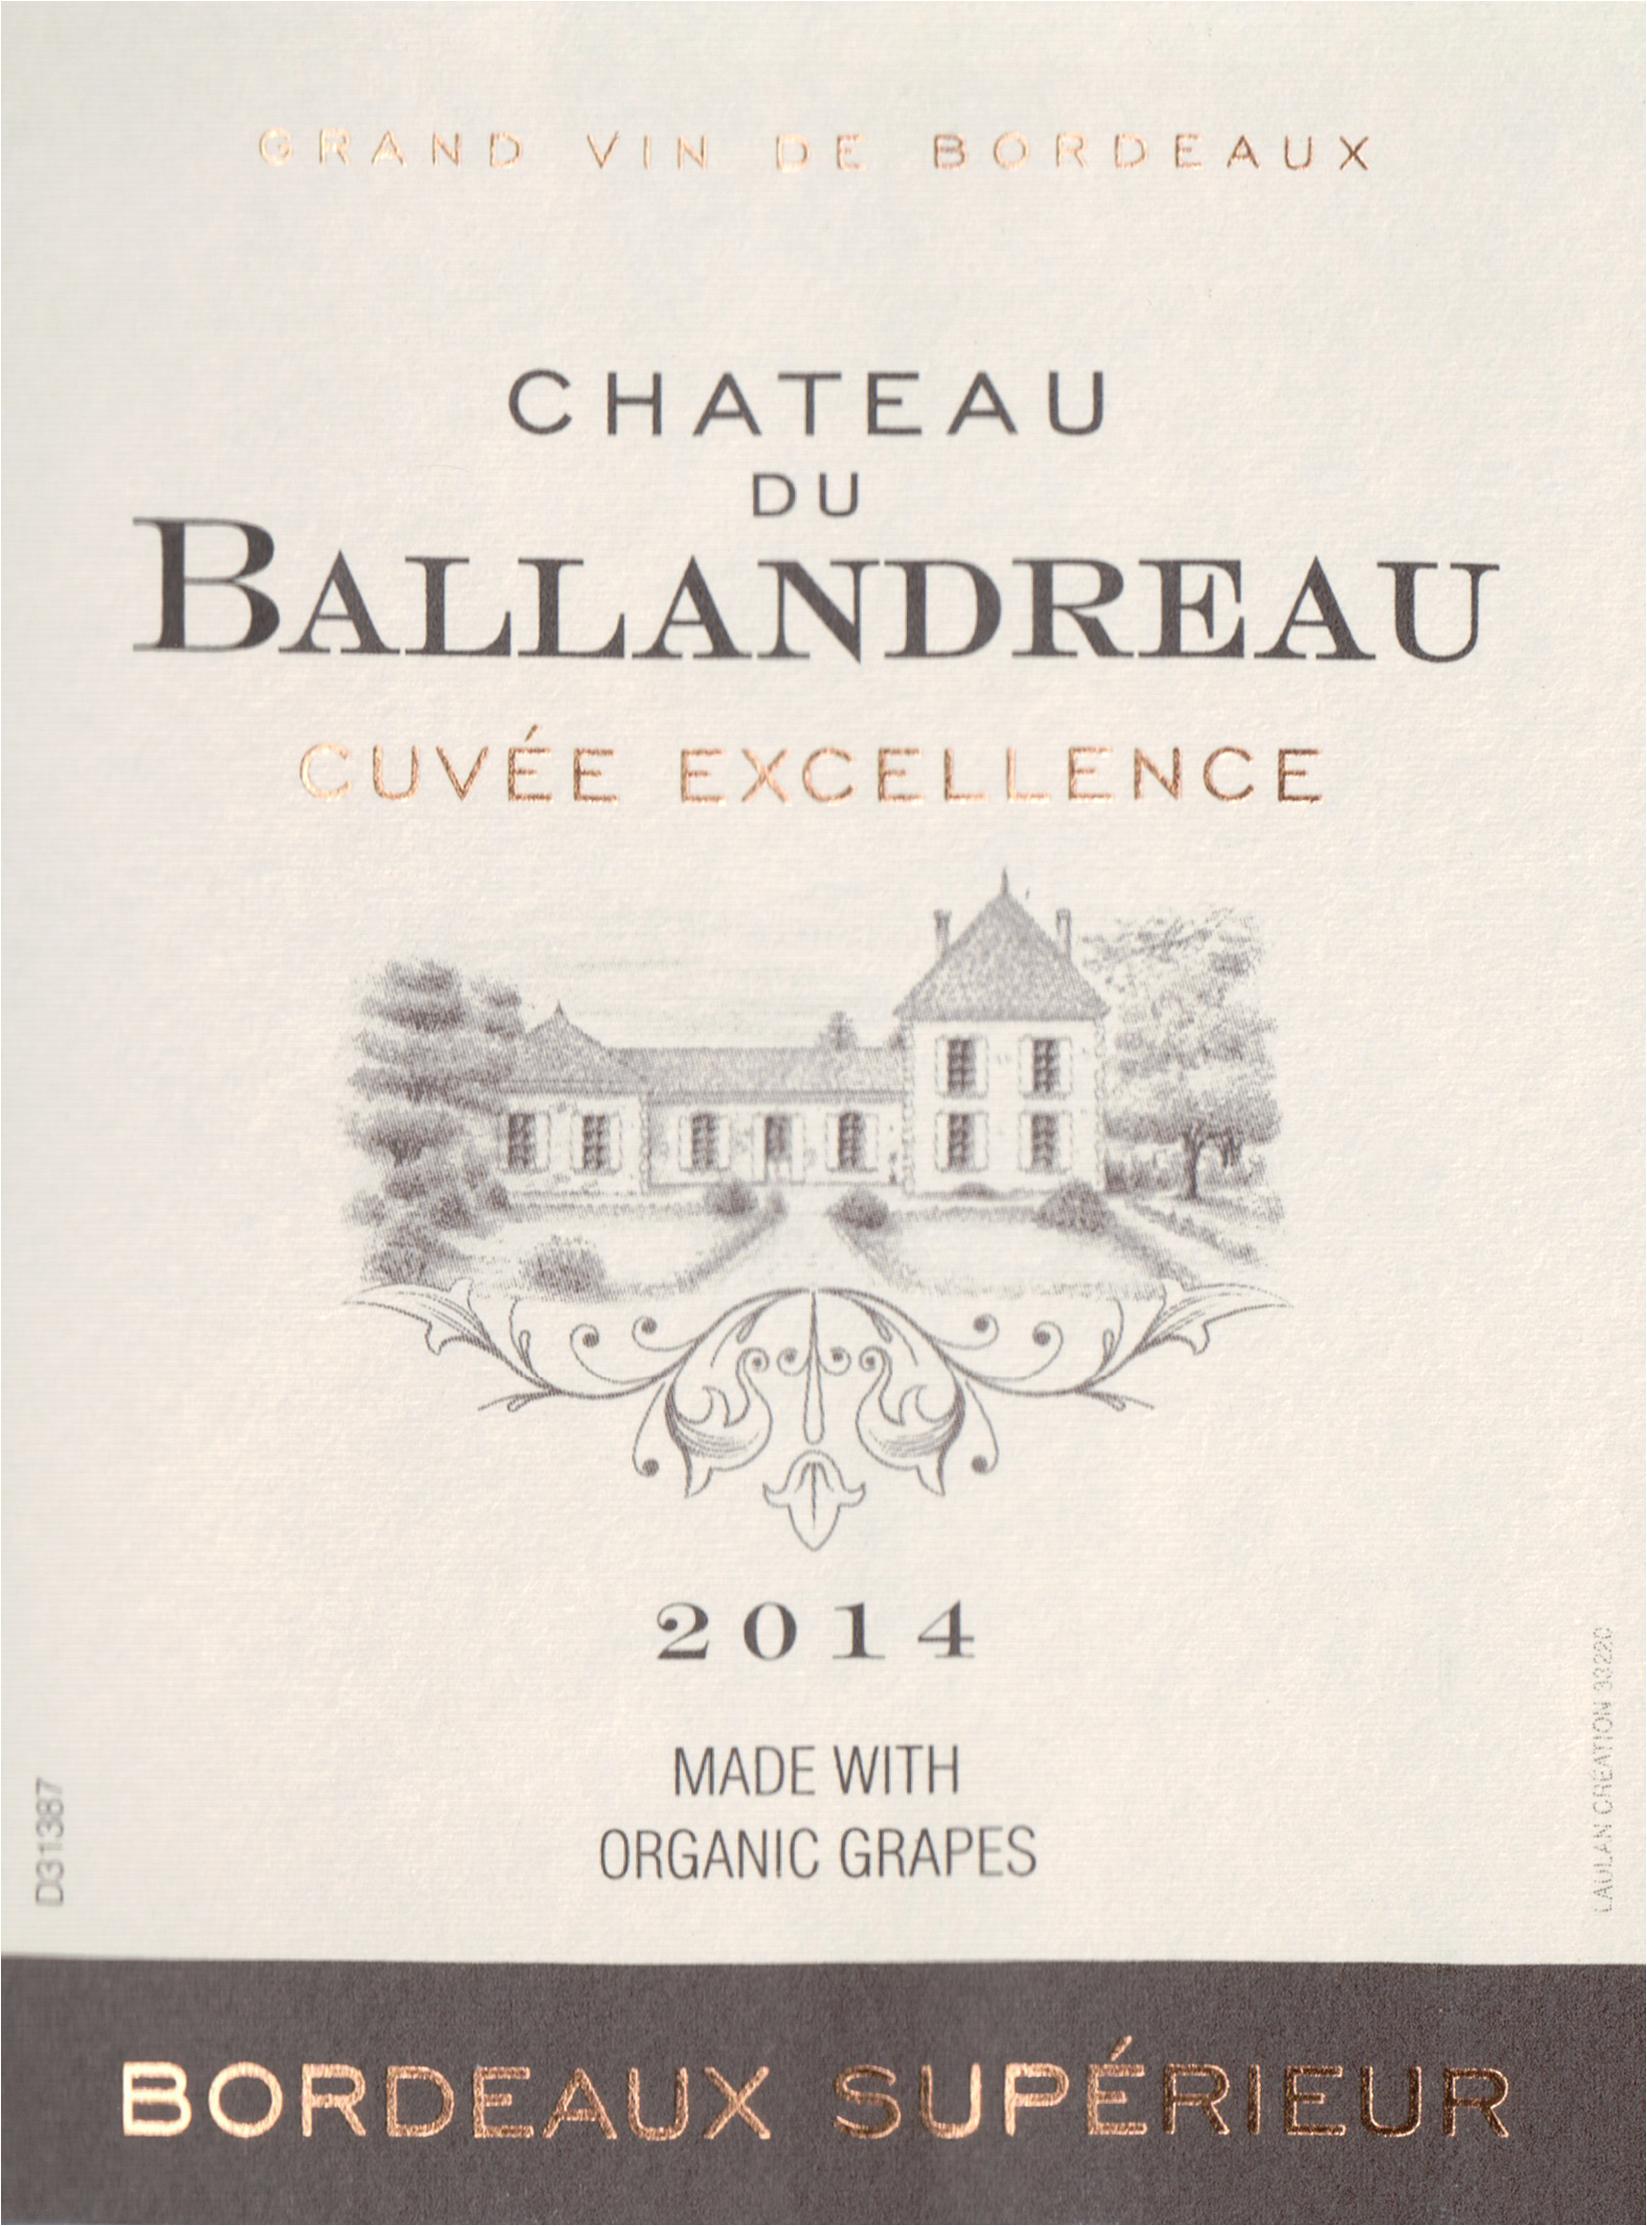 Chateau Ballandreau 2014